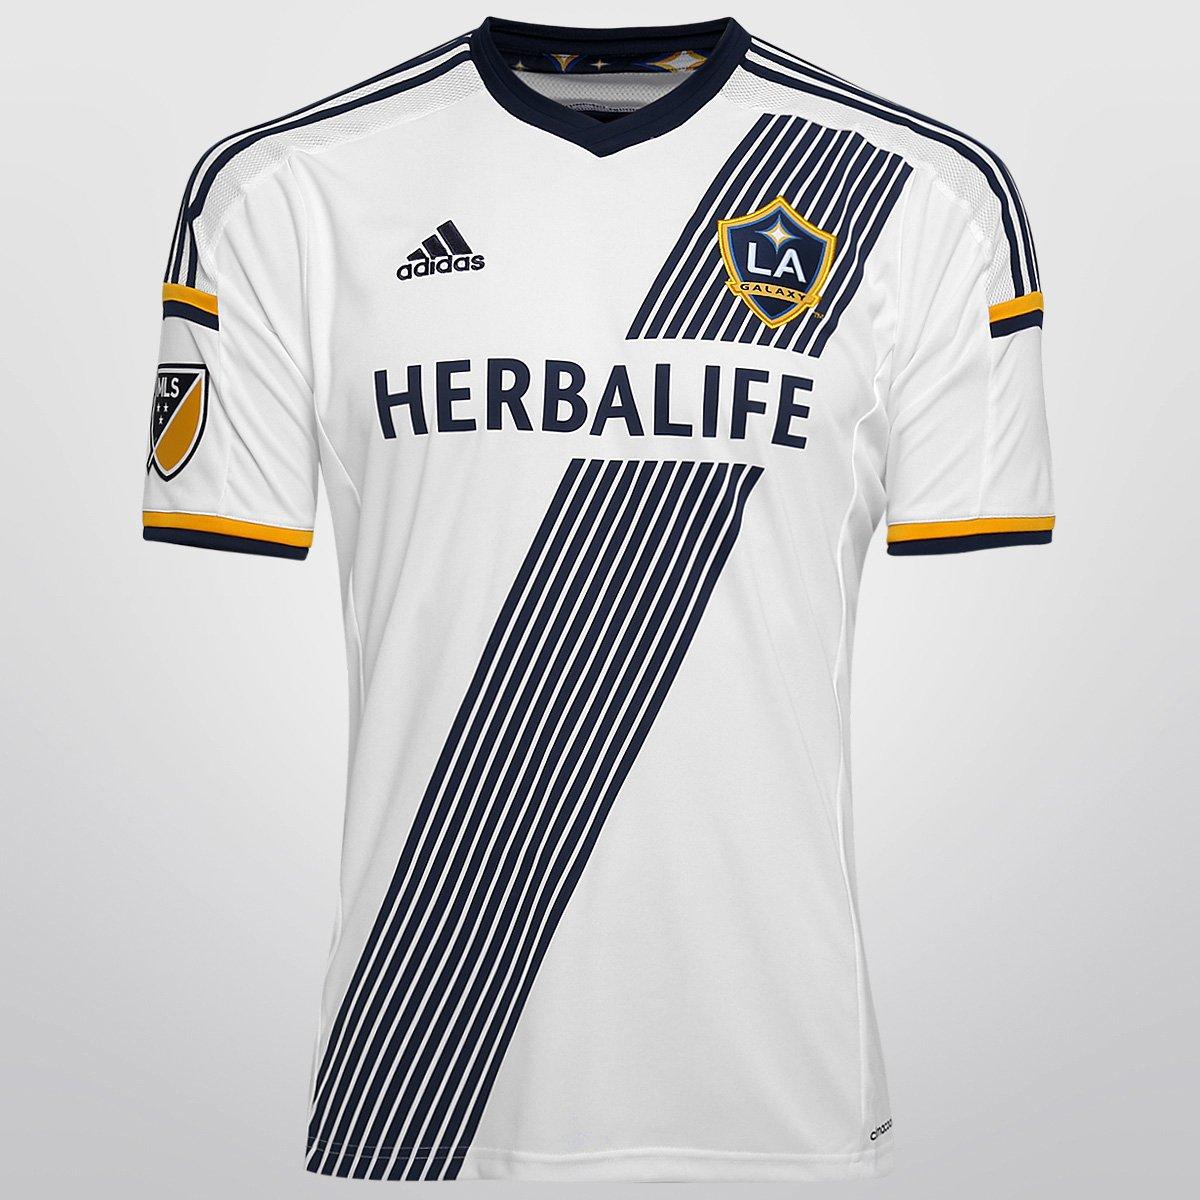 887059fe81 Camisa Adidas MLS Los Angeles Galaxy Home 15/16 s/nº | Netshoes